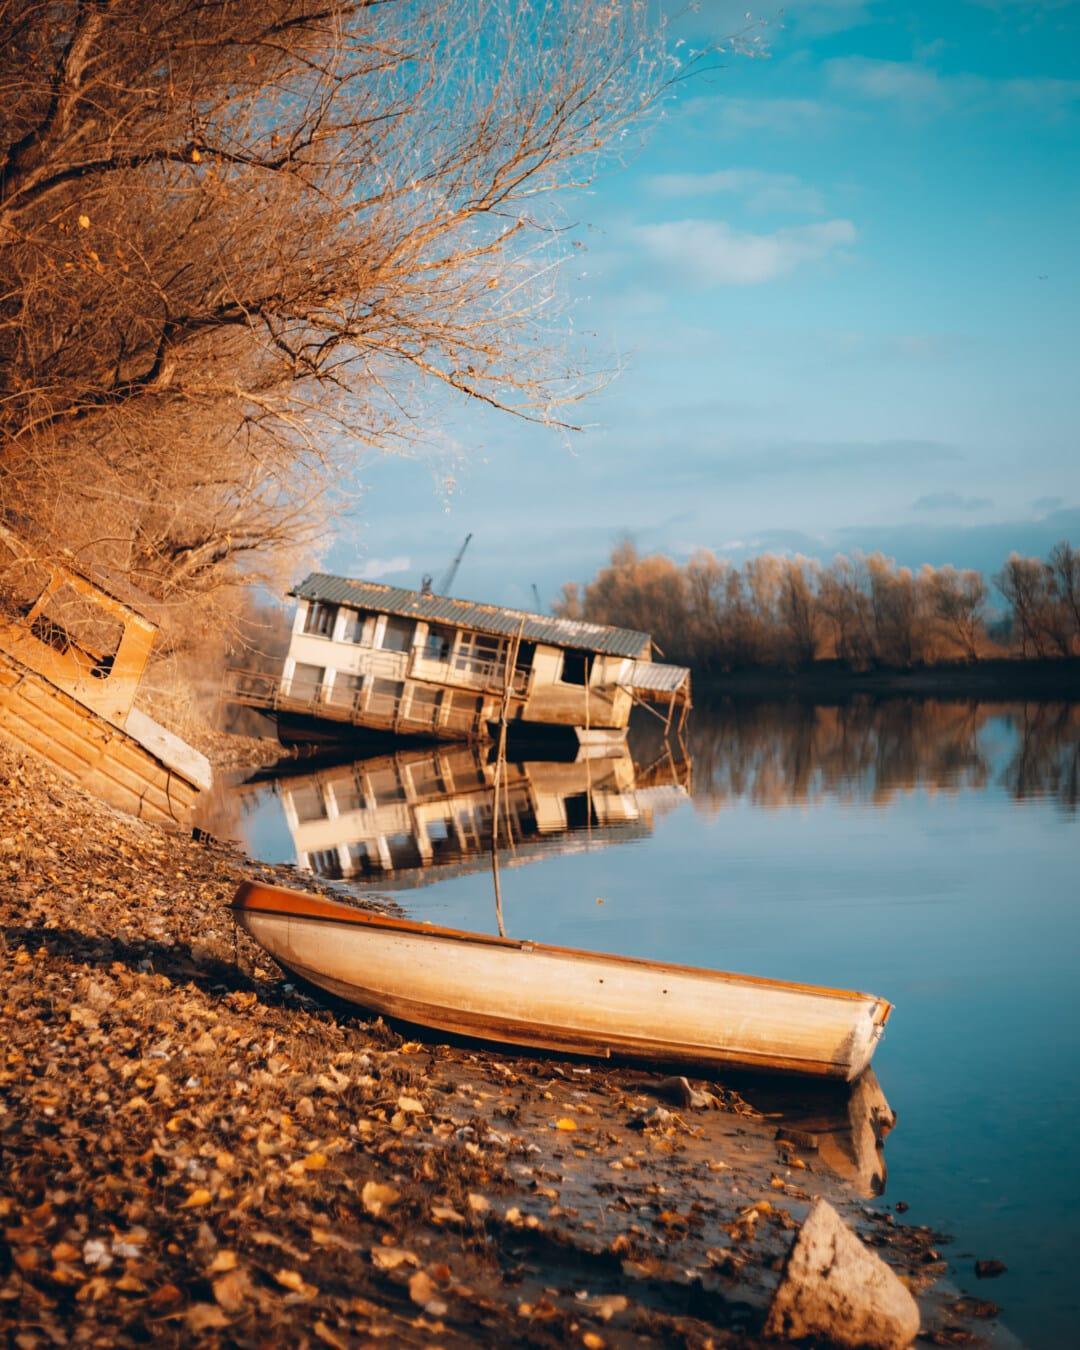 boathouse, boats, boat, wreckage, floodplain, decay, flood, abandoned, sunset, river